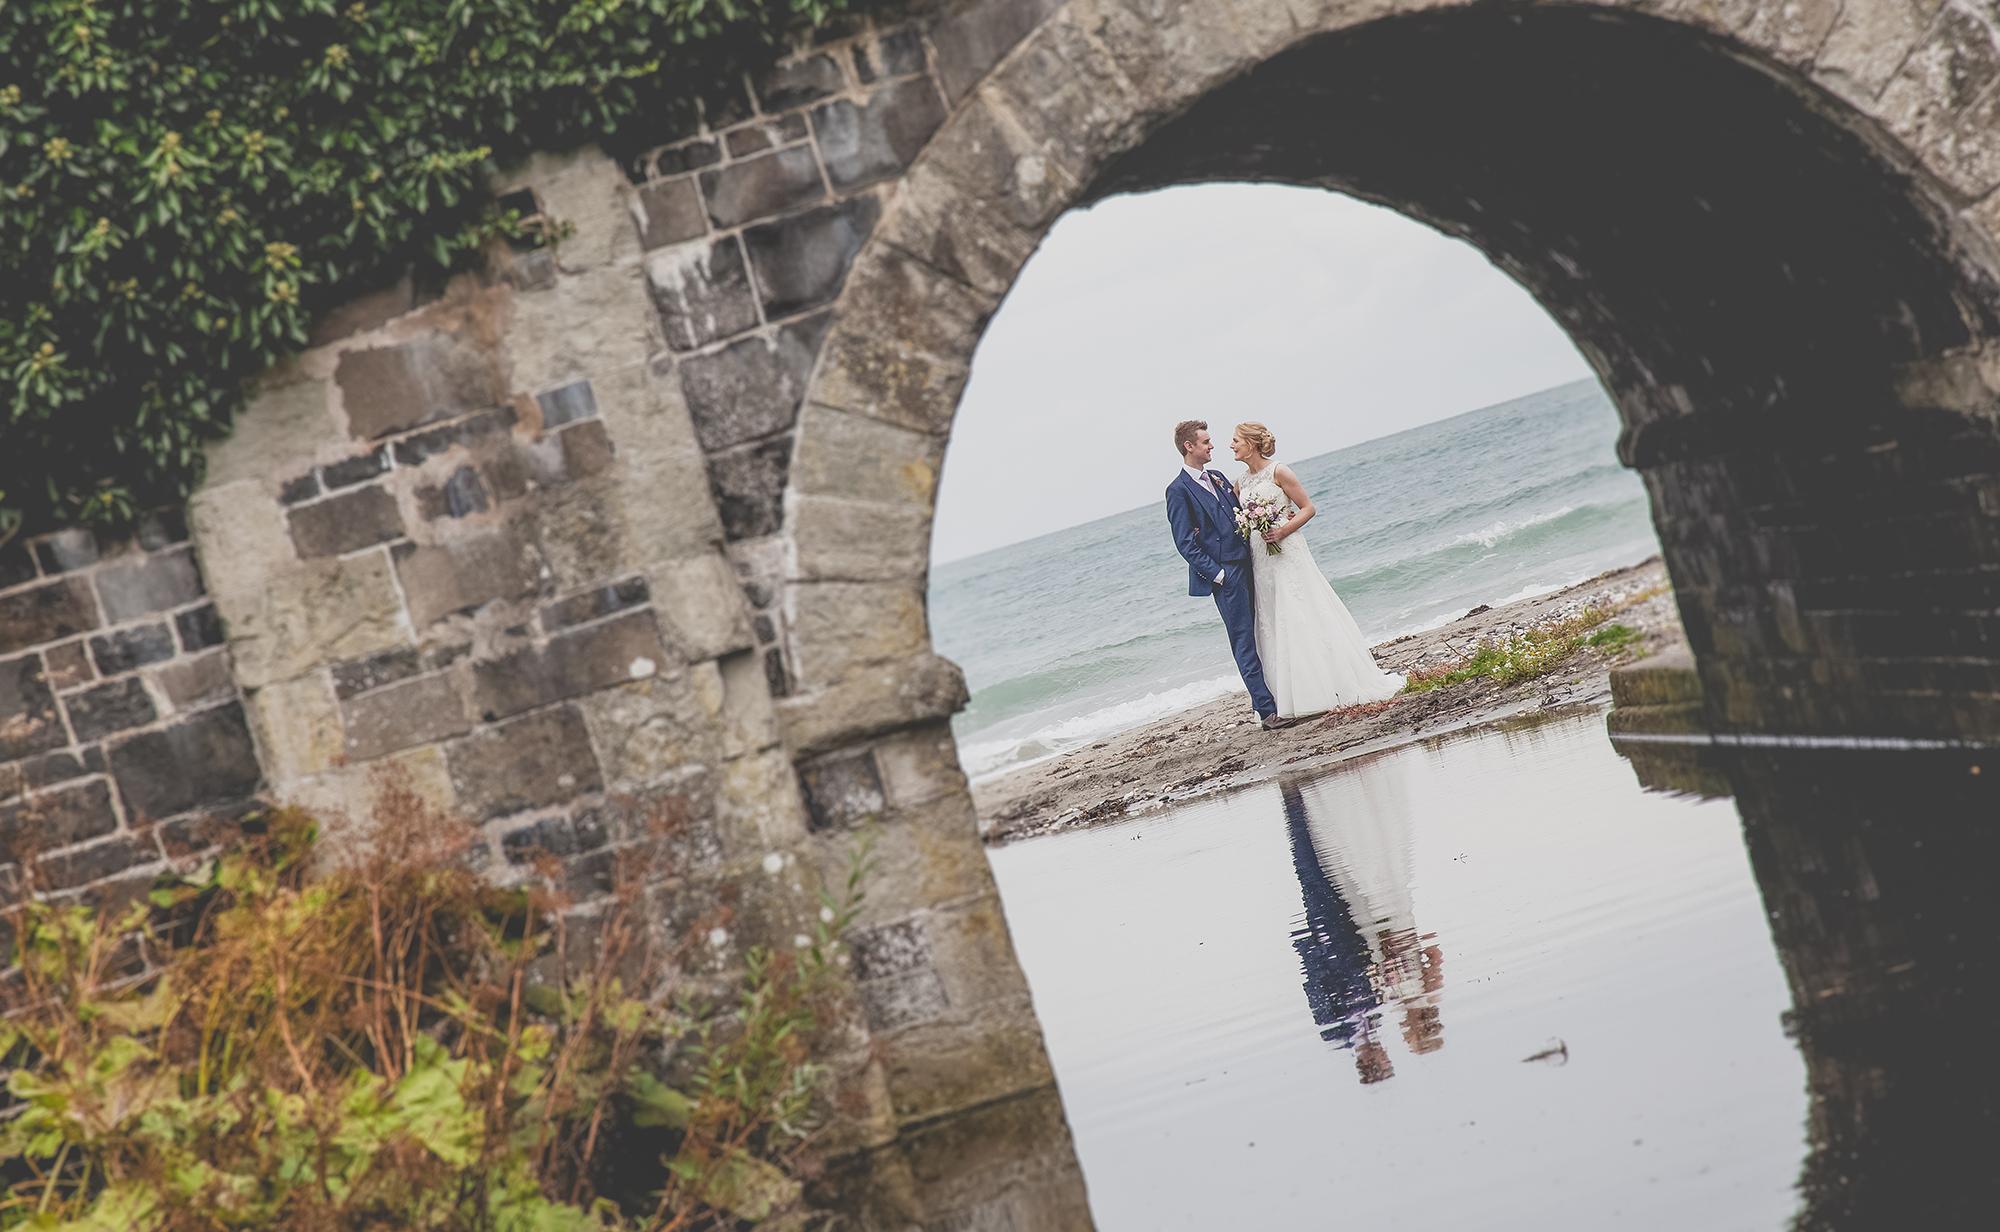 ballygally wedding photography tc photography larne belfast lisburn 2